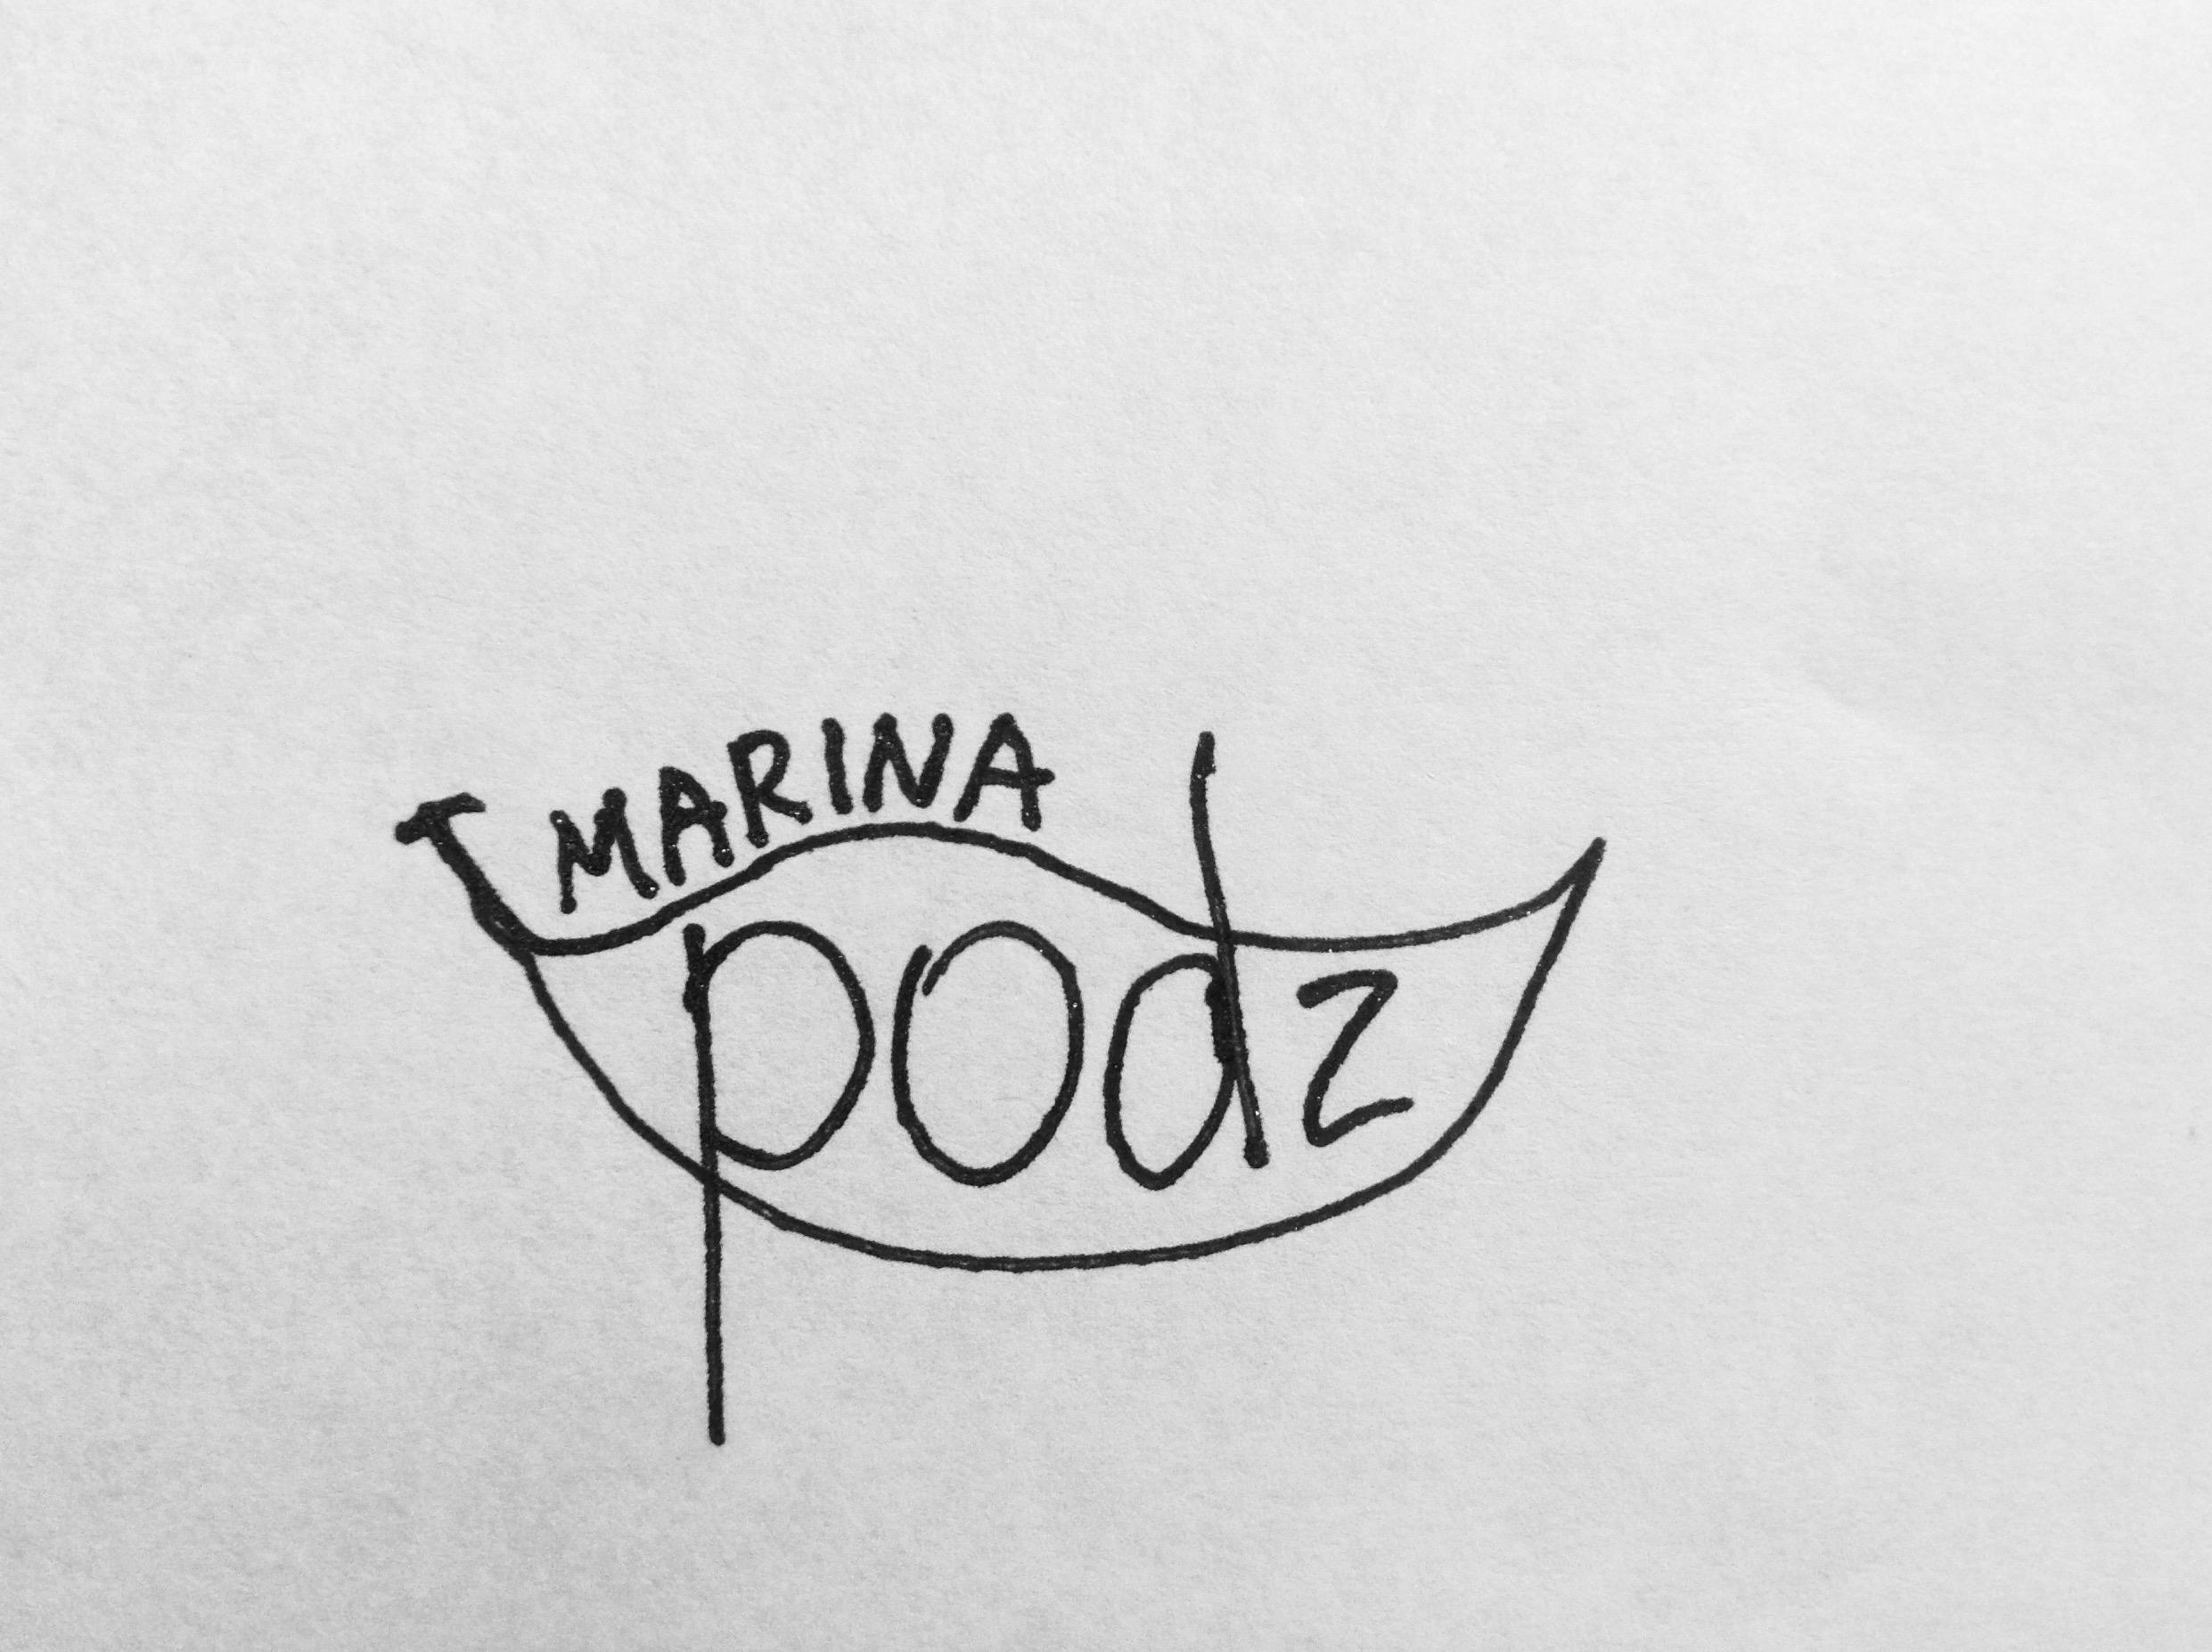 Marina Podzorova's Signature